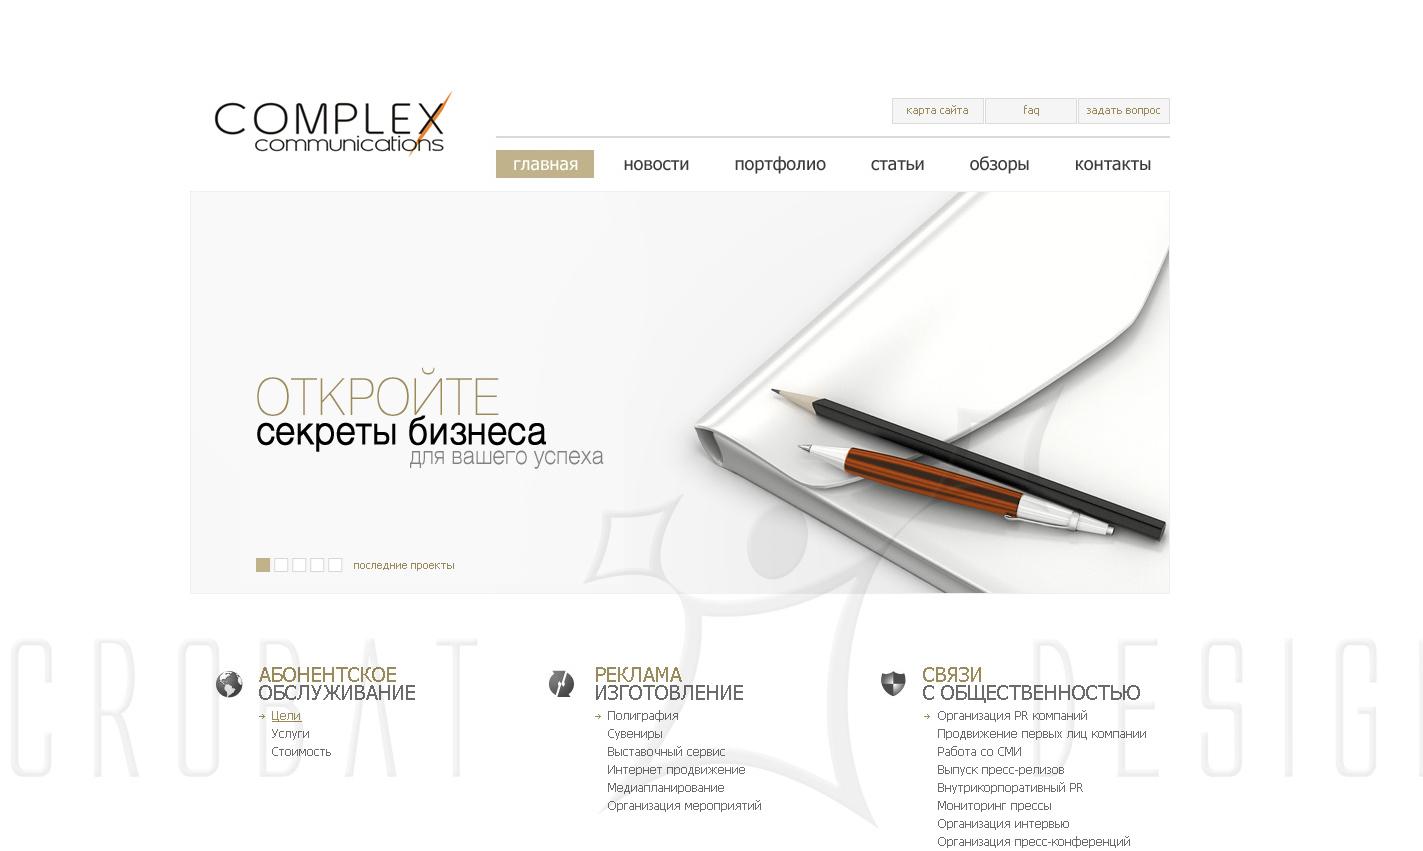 COMPEX COM